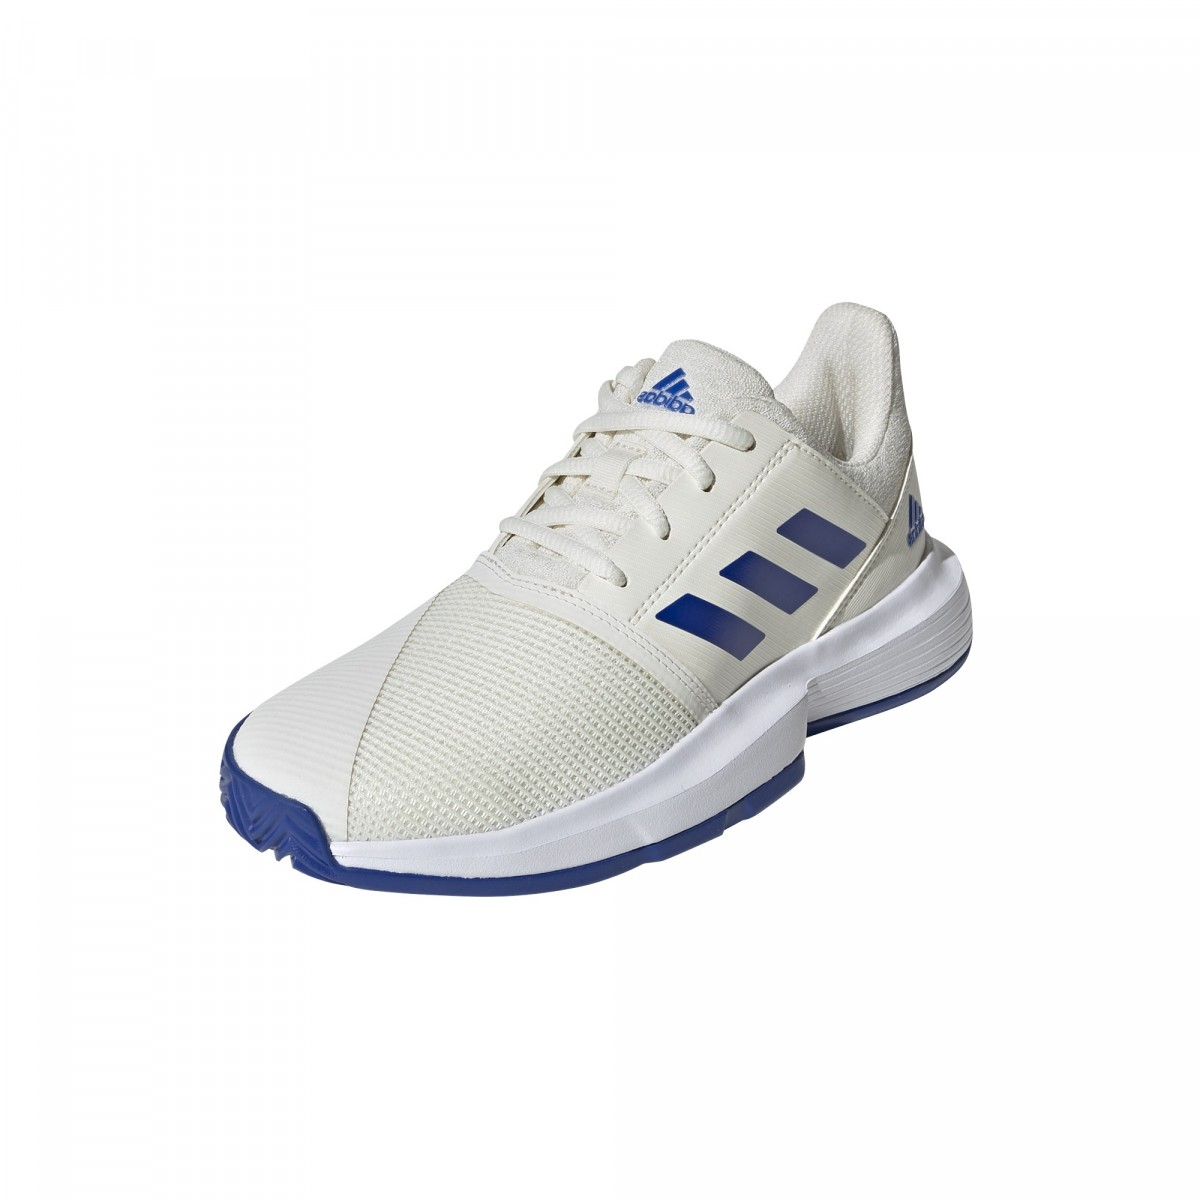 Детские теннисные кроссовки adidas CourtJam Junior white/royal blue/white